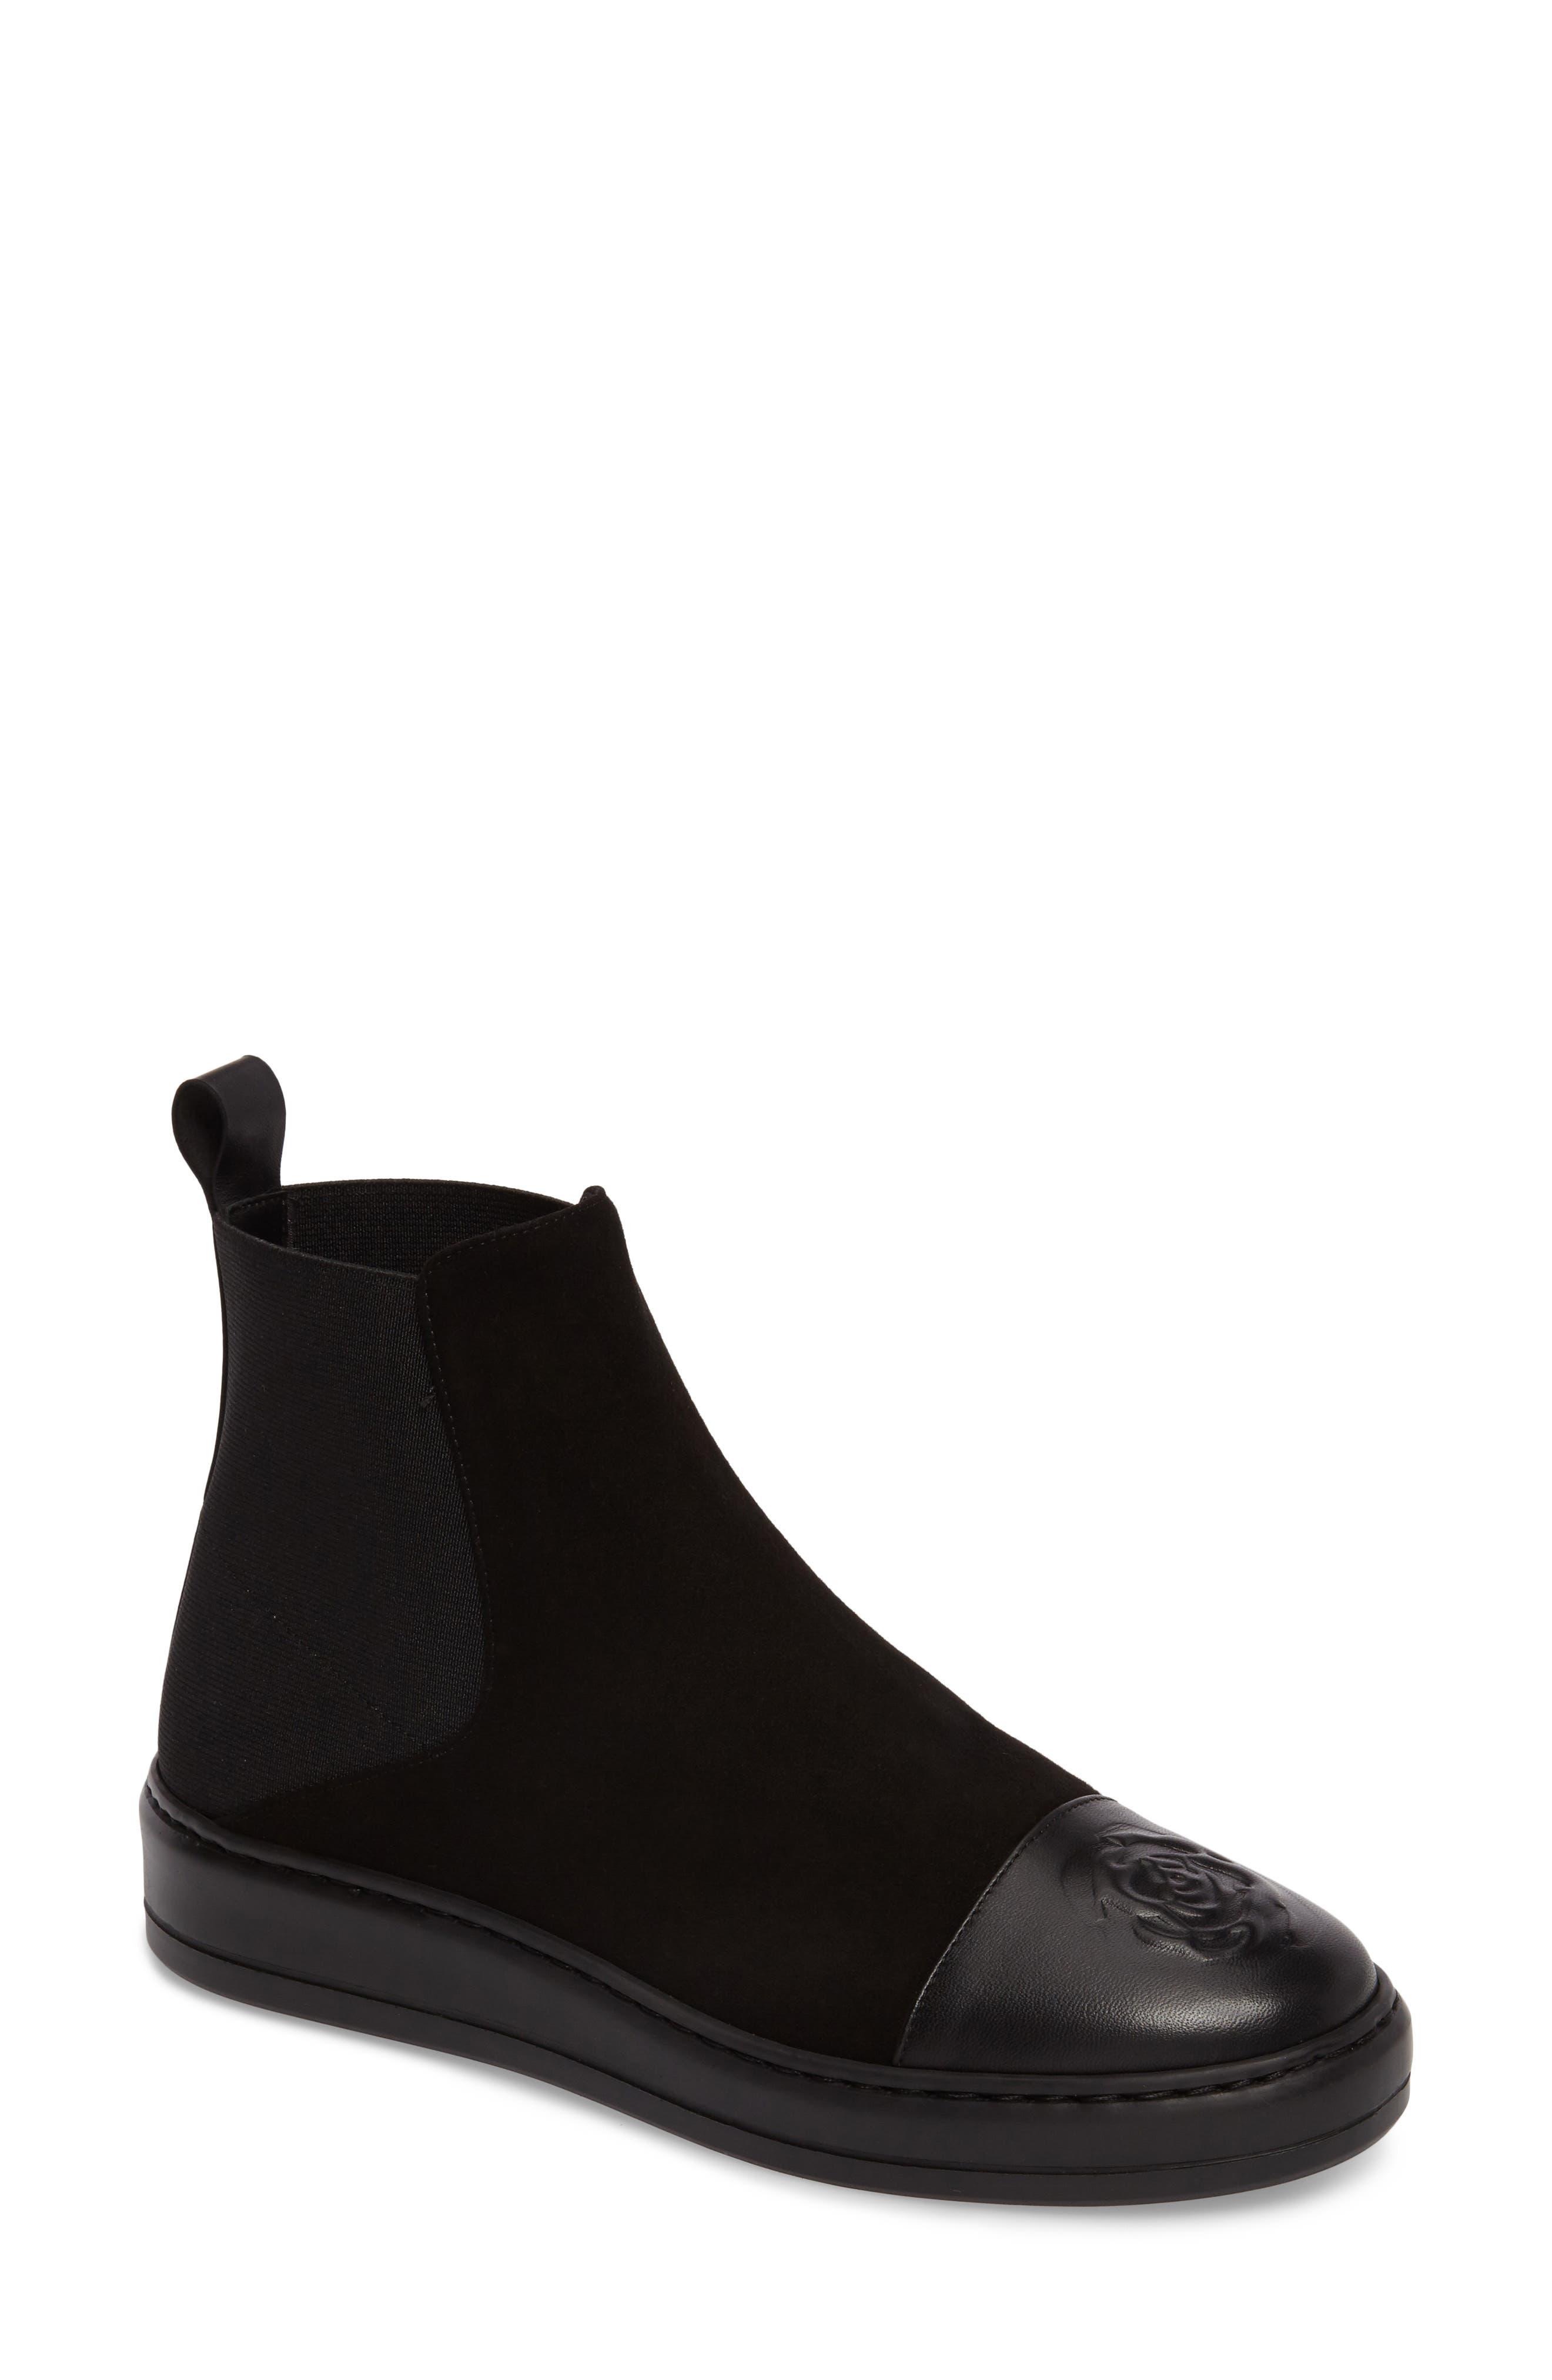 Cecilia High Top Sneaker in Black Suede